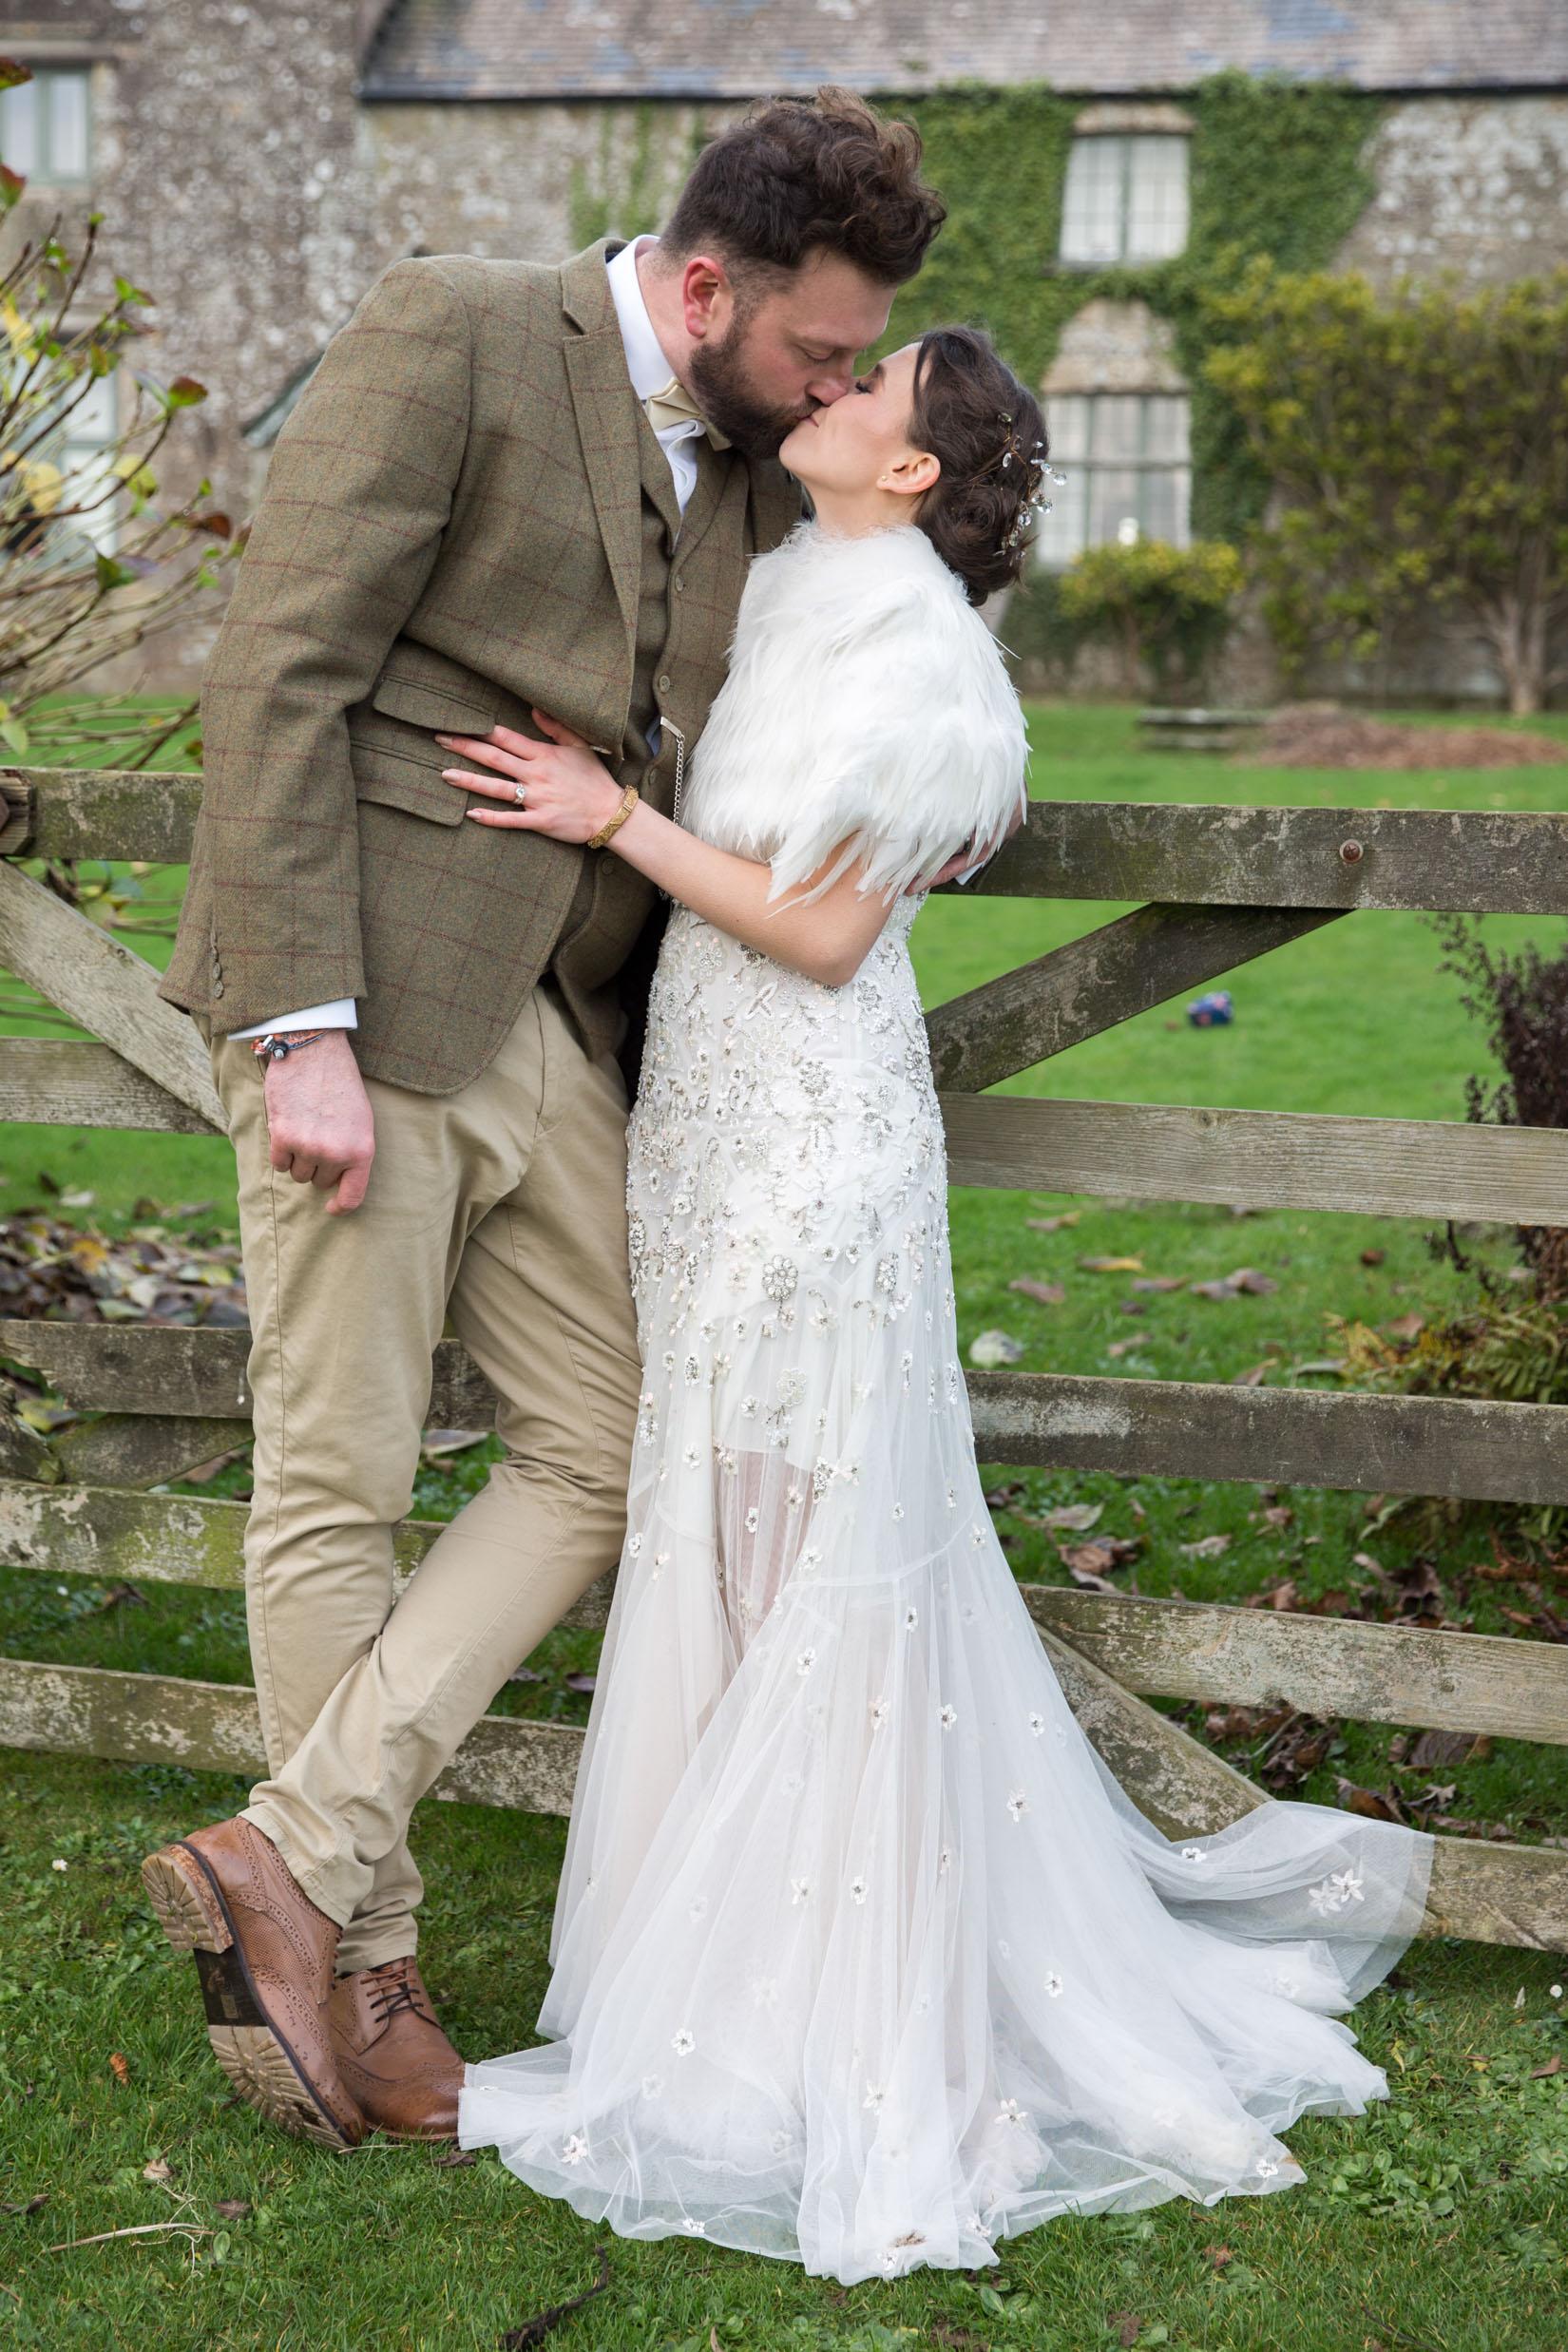 Jess & Ben - Bristol Wedding Photographer - Wright Wedding Photography - 118